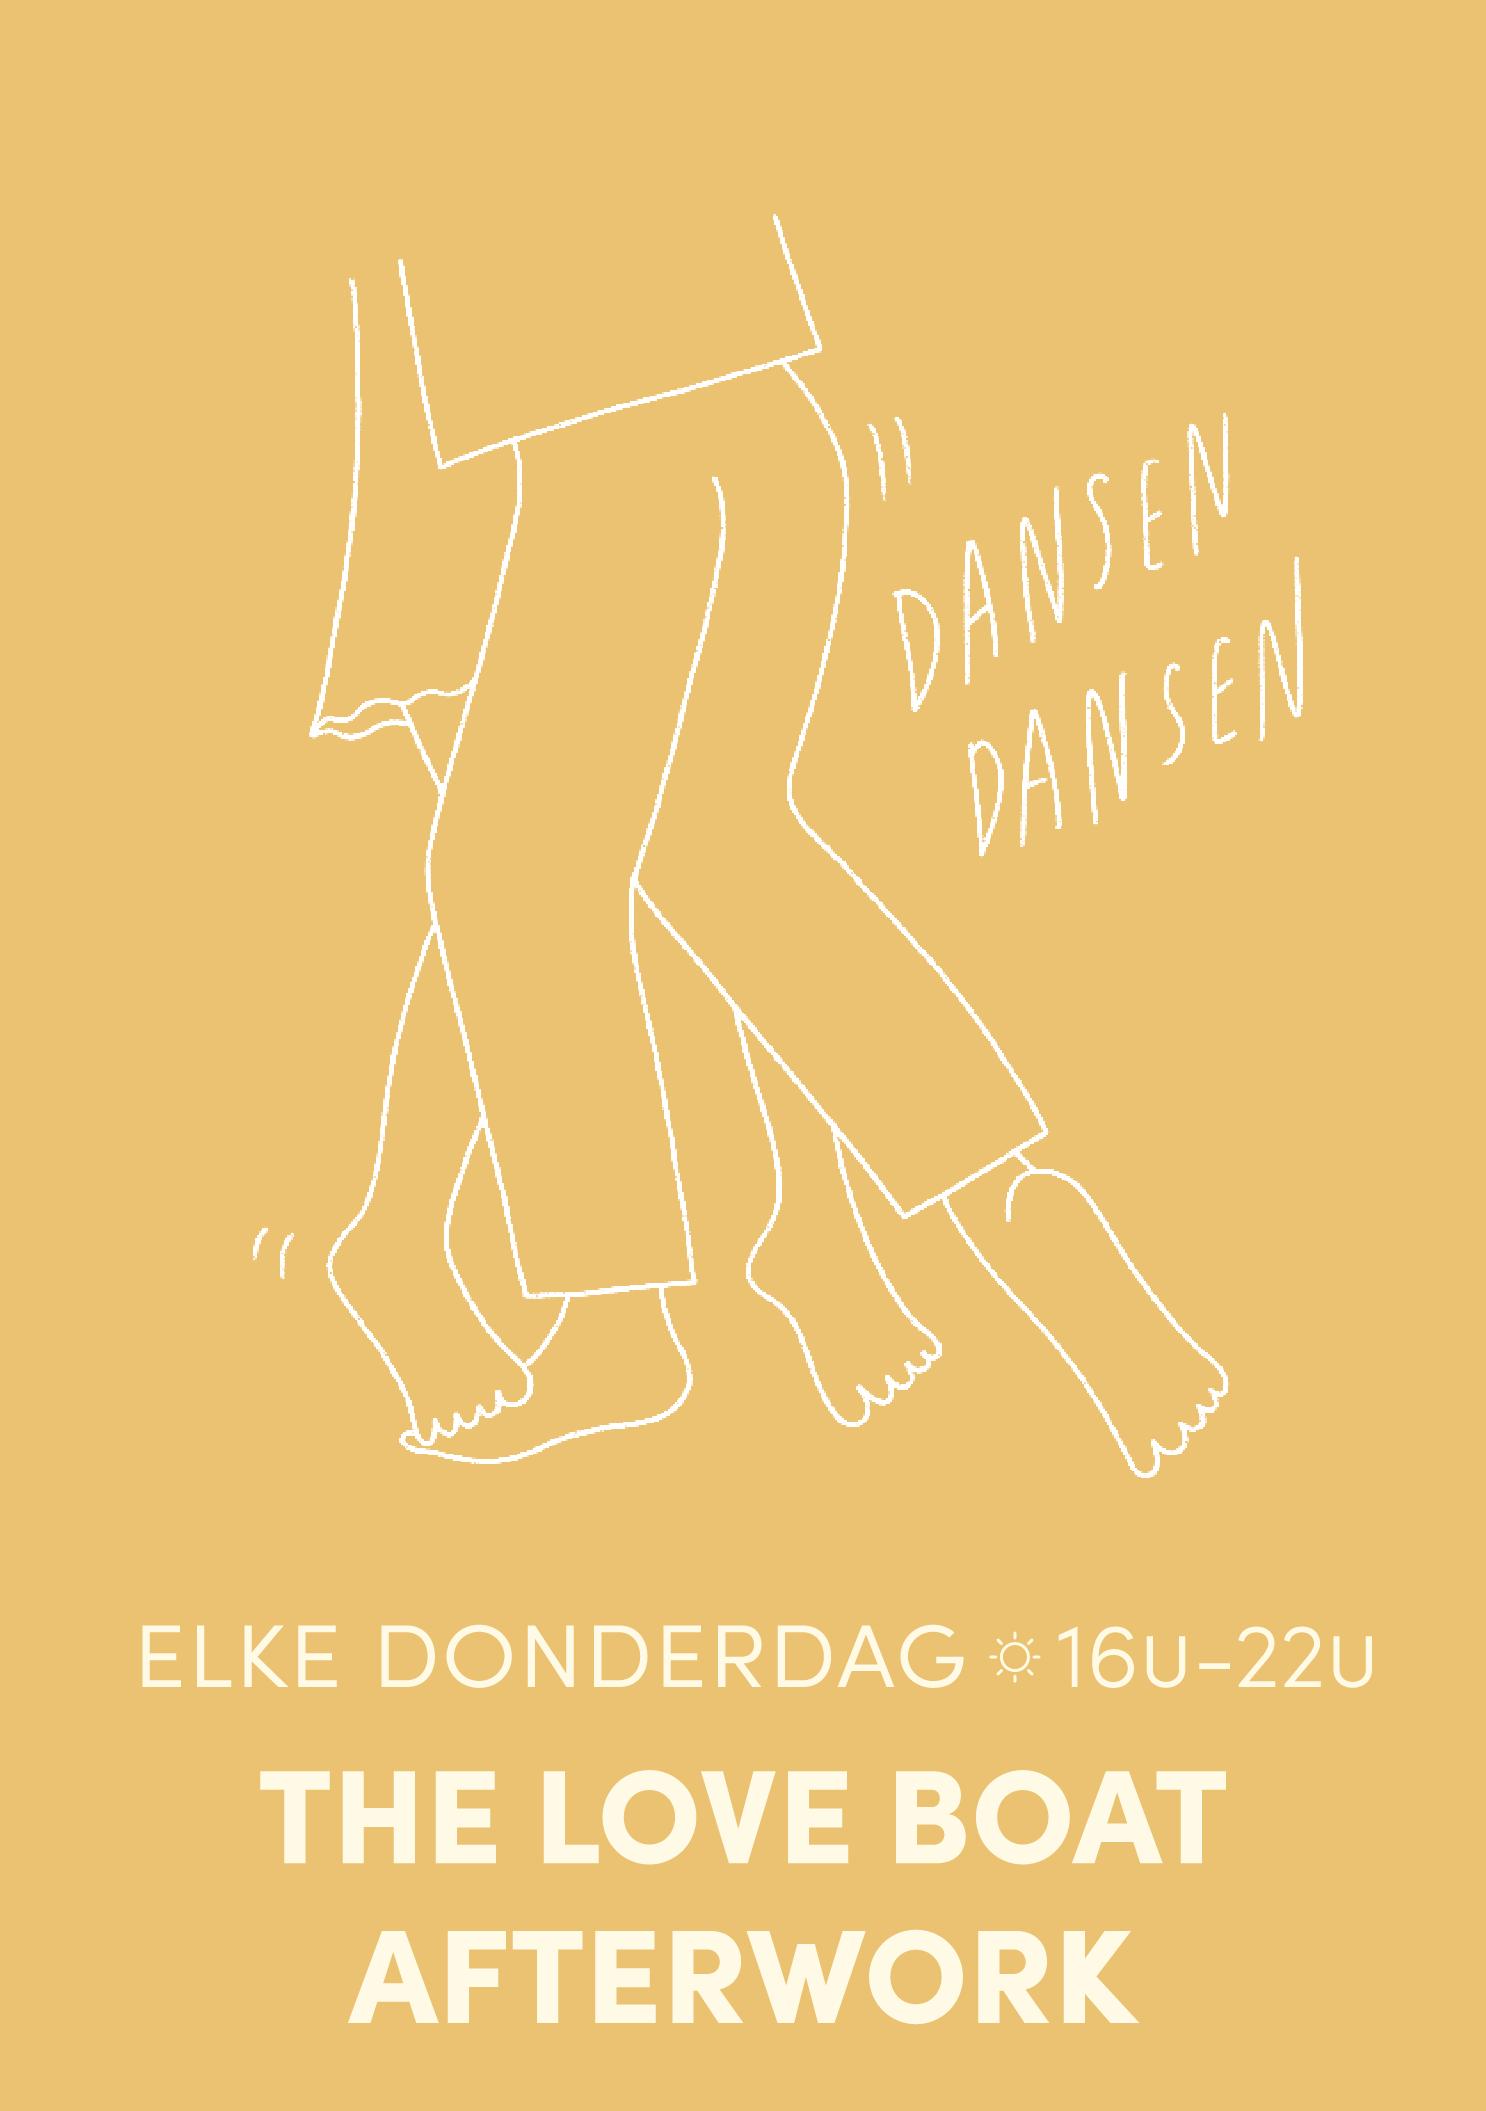 ELKE DONDERDAG:  AFTERWORK /// THE LOVE BOAT